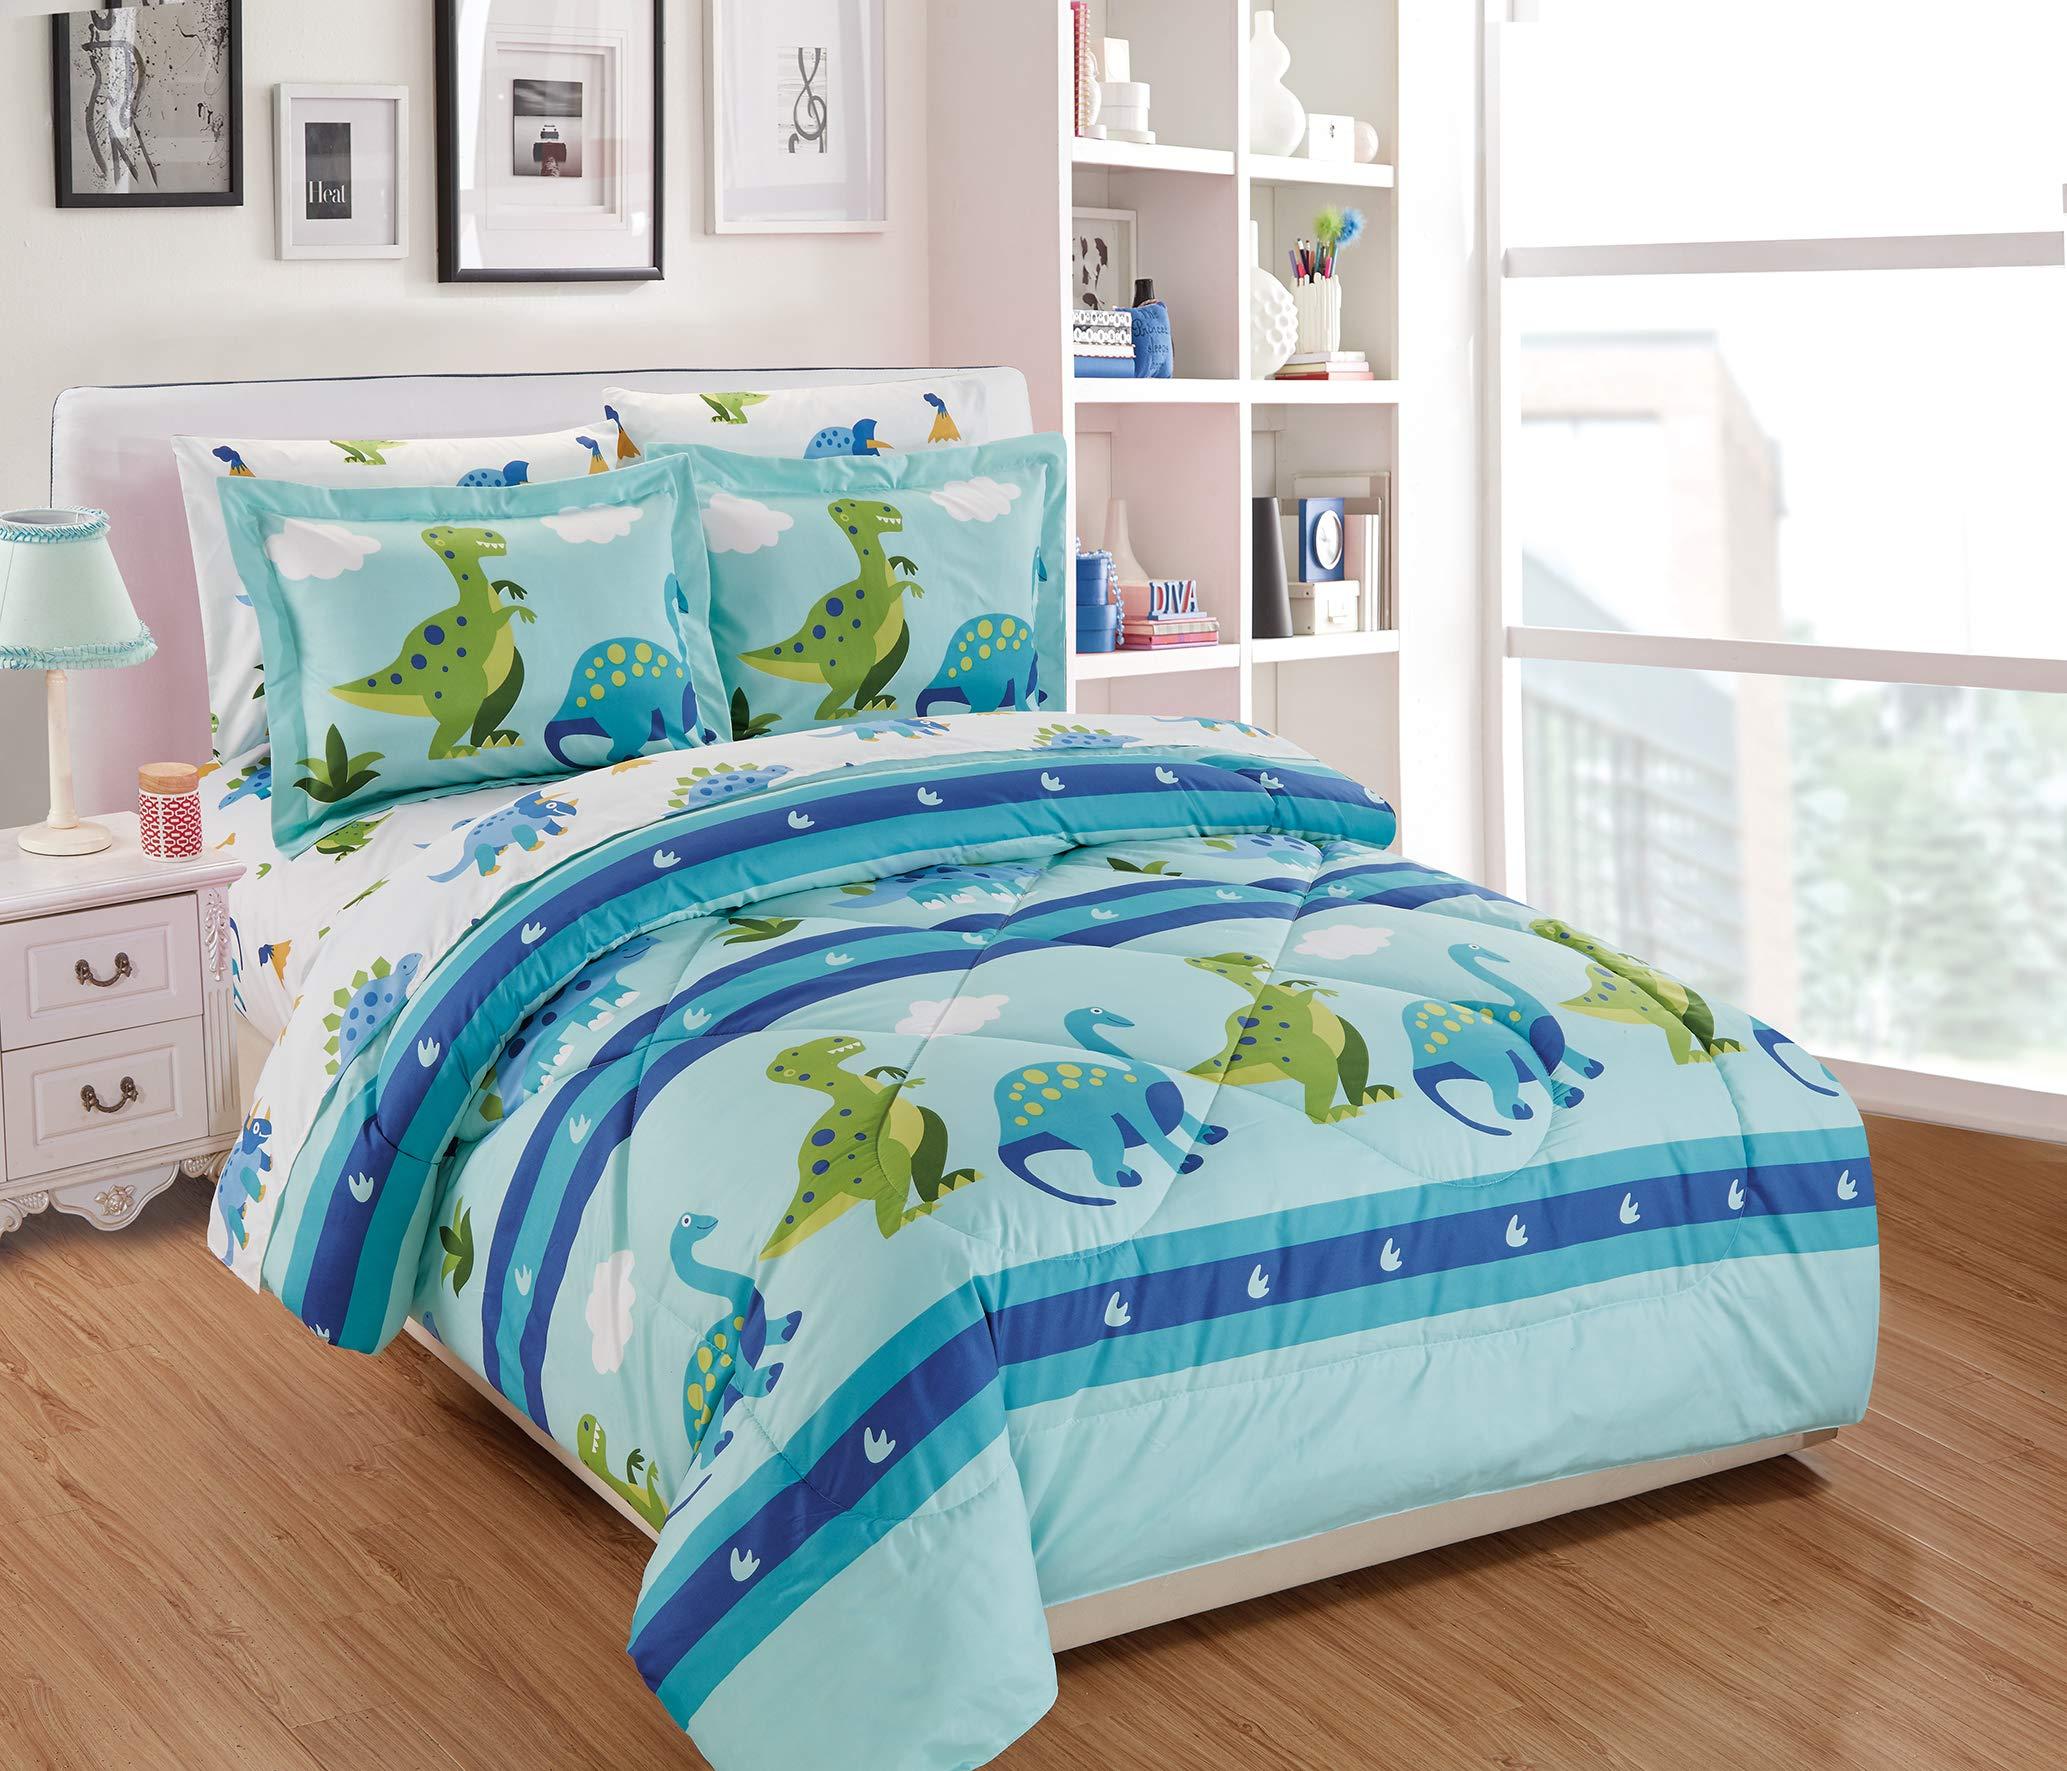 Fancy Linen 5pc Twin Comforter Set Dinosaur Rhino Aqua Green White Blue New